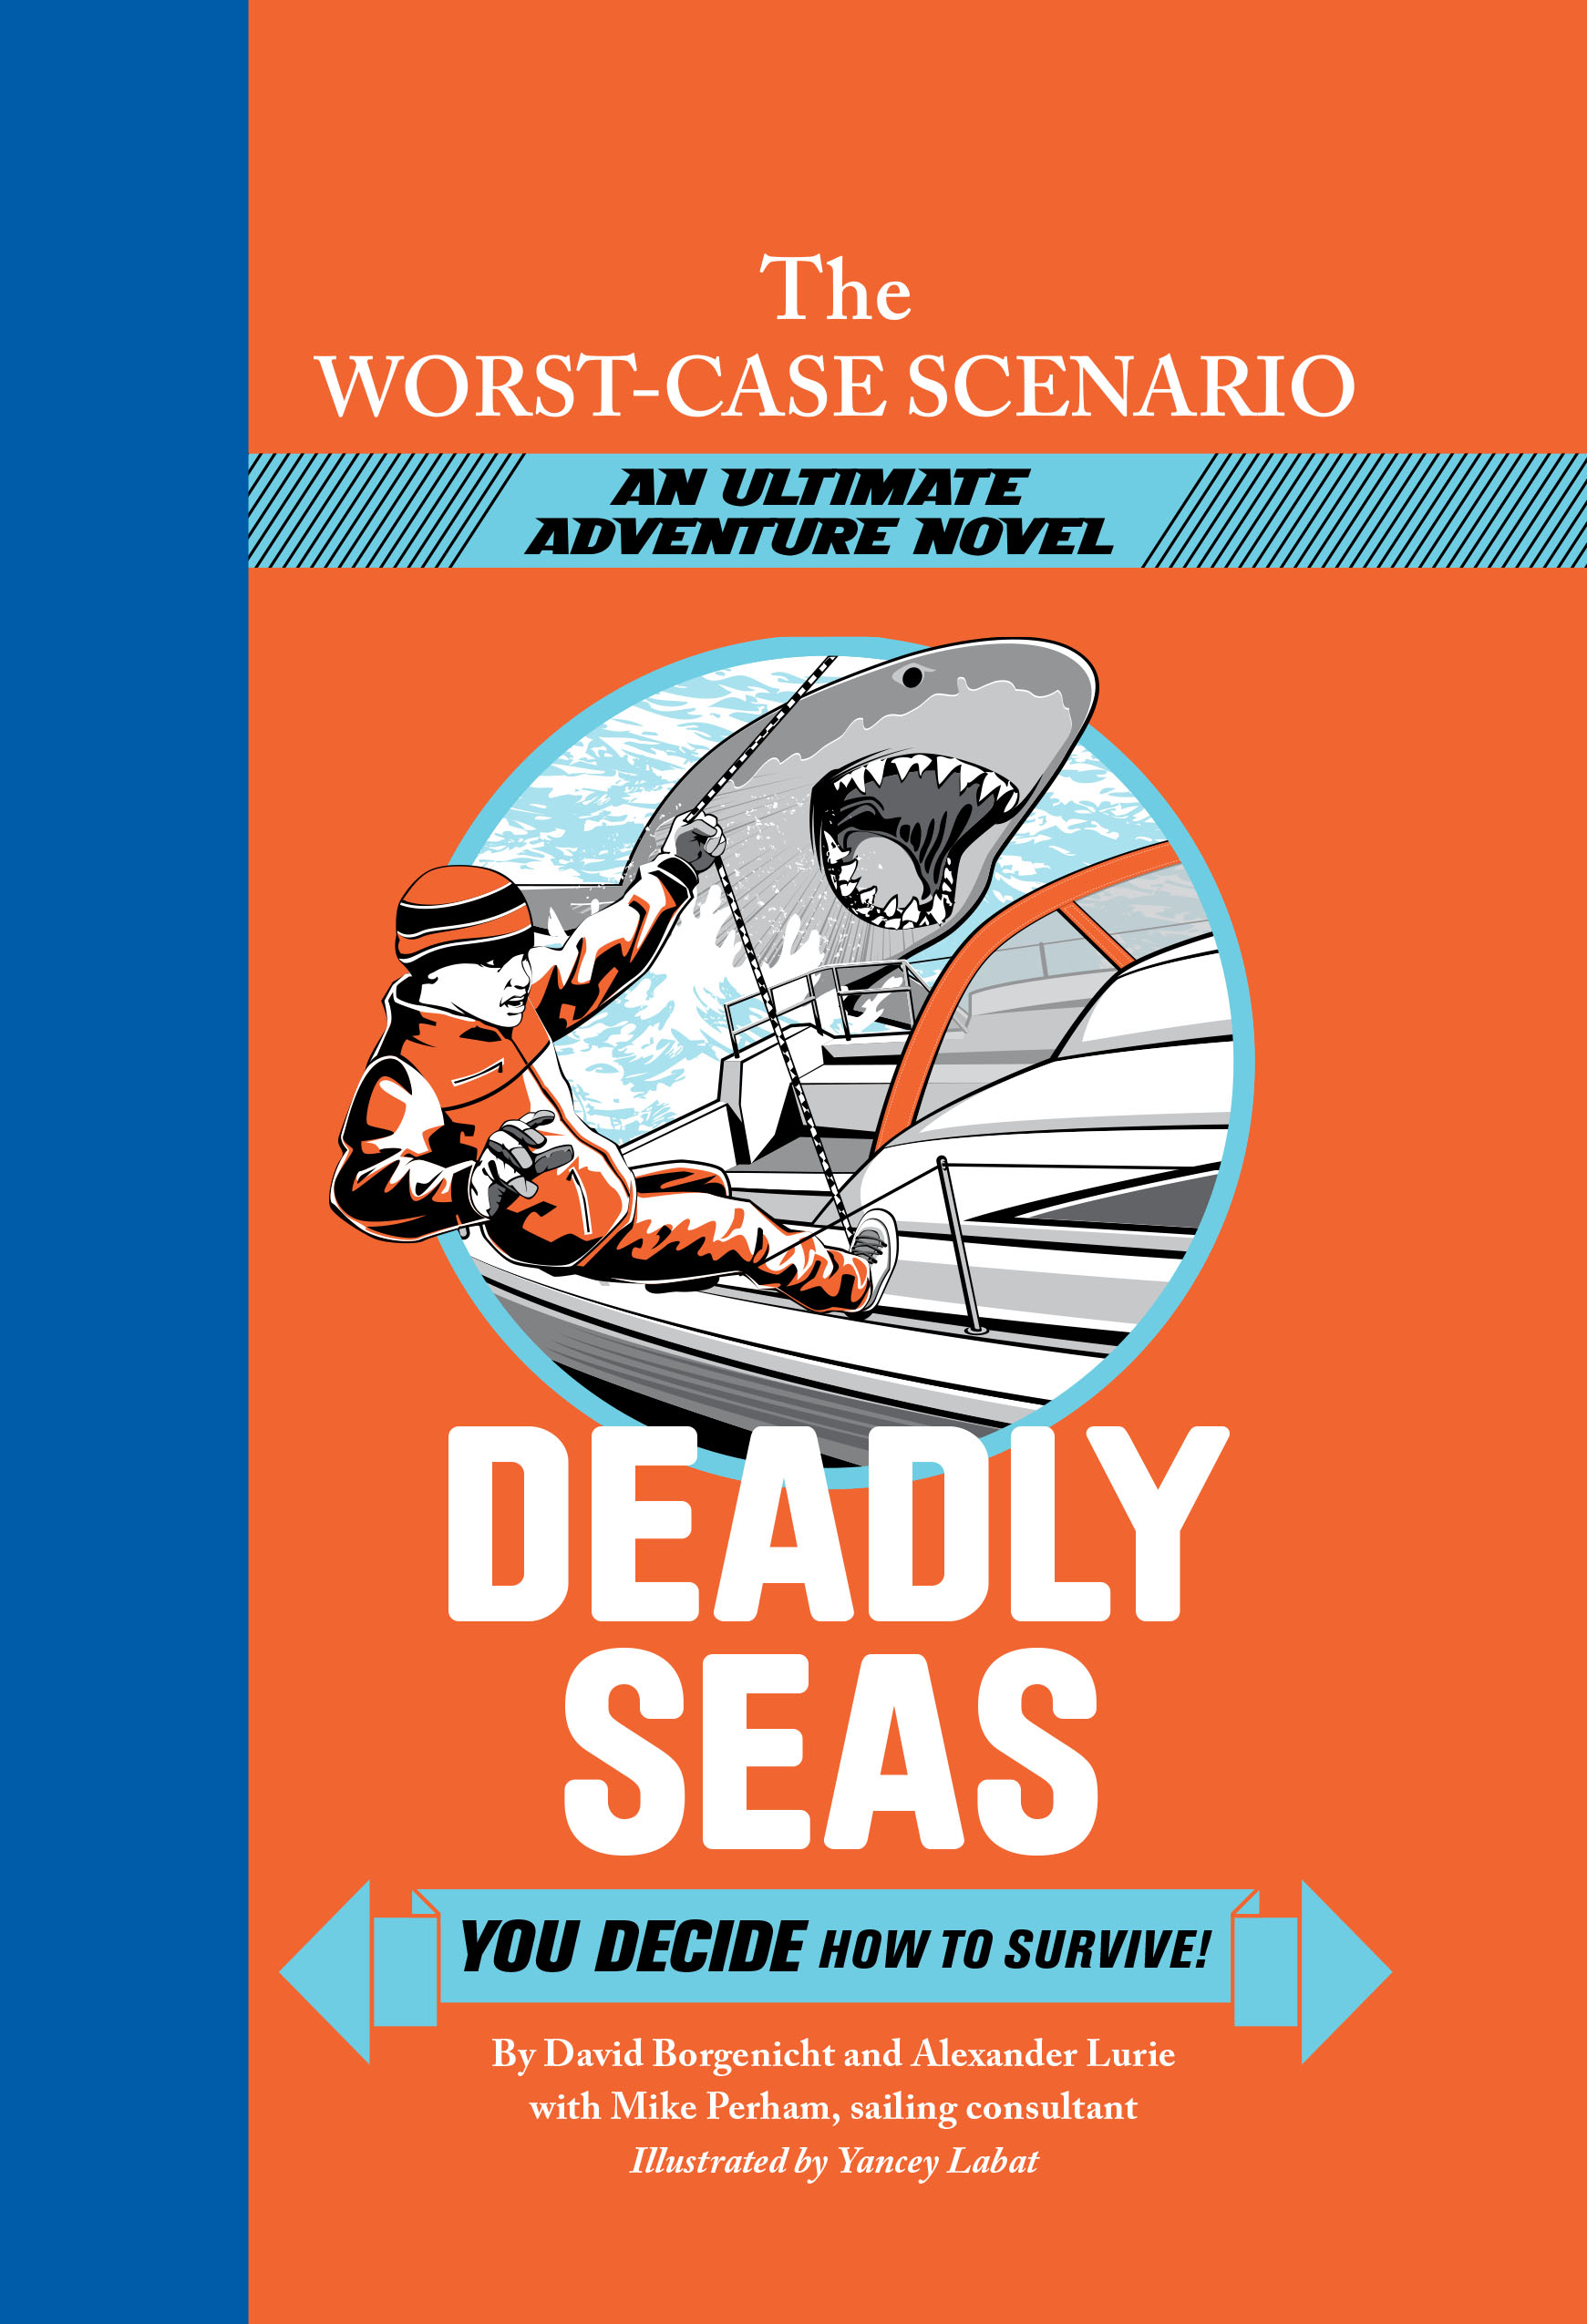 WCS Deadly Seas-1.jpg